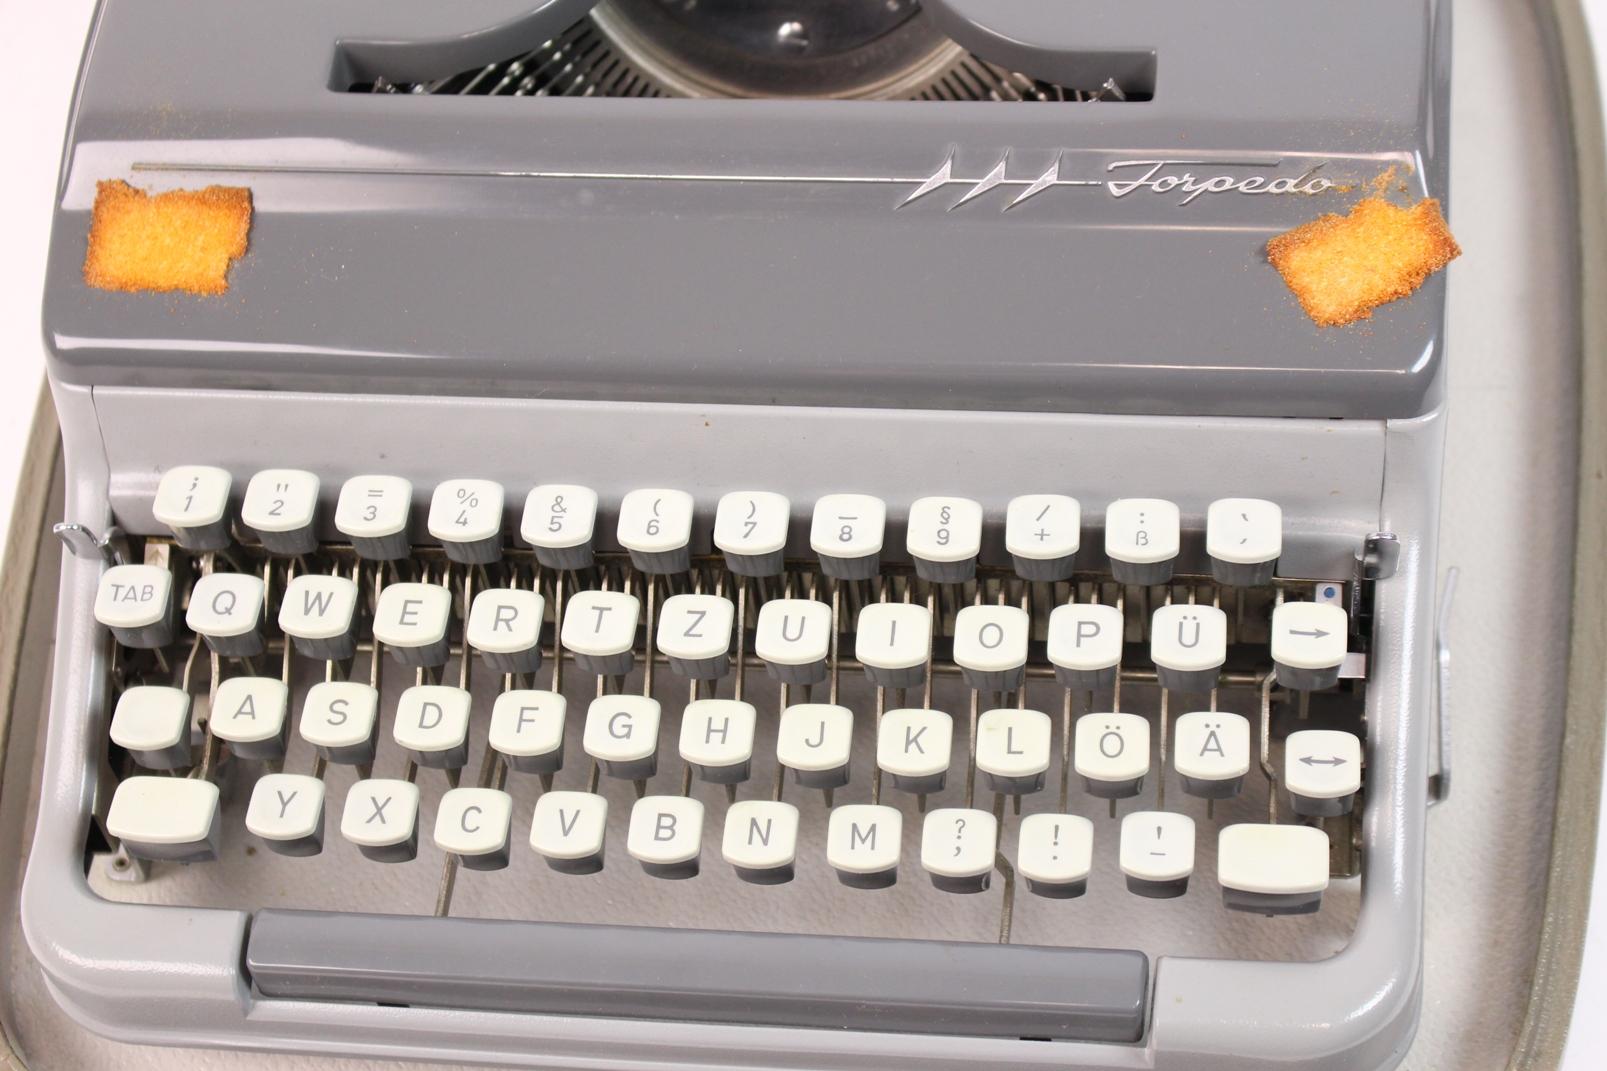 torpedo reiise schreibmaschine metall kunststoff grau vintage typewriter um 1960. Black Bedroom Furniture Sets. Home Design Ideas